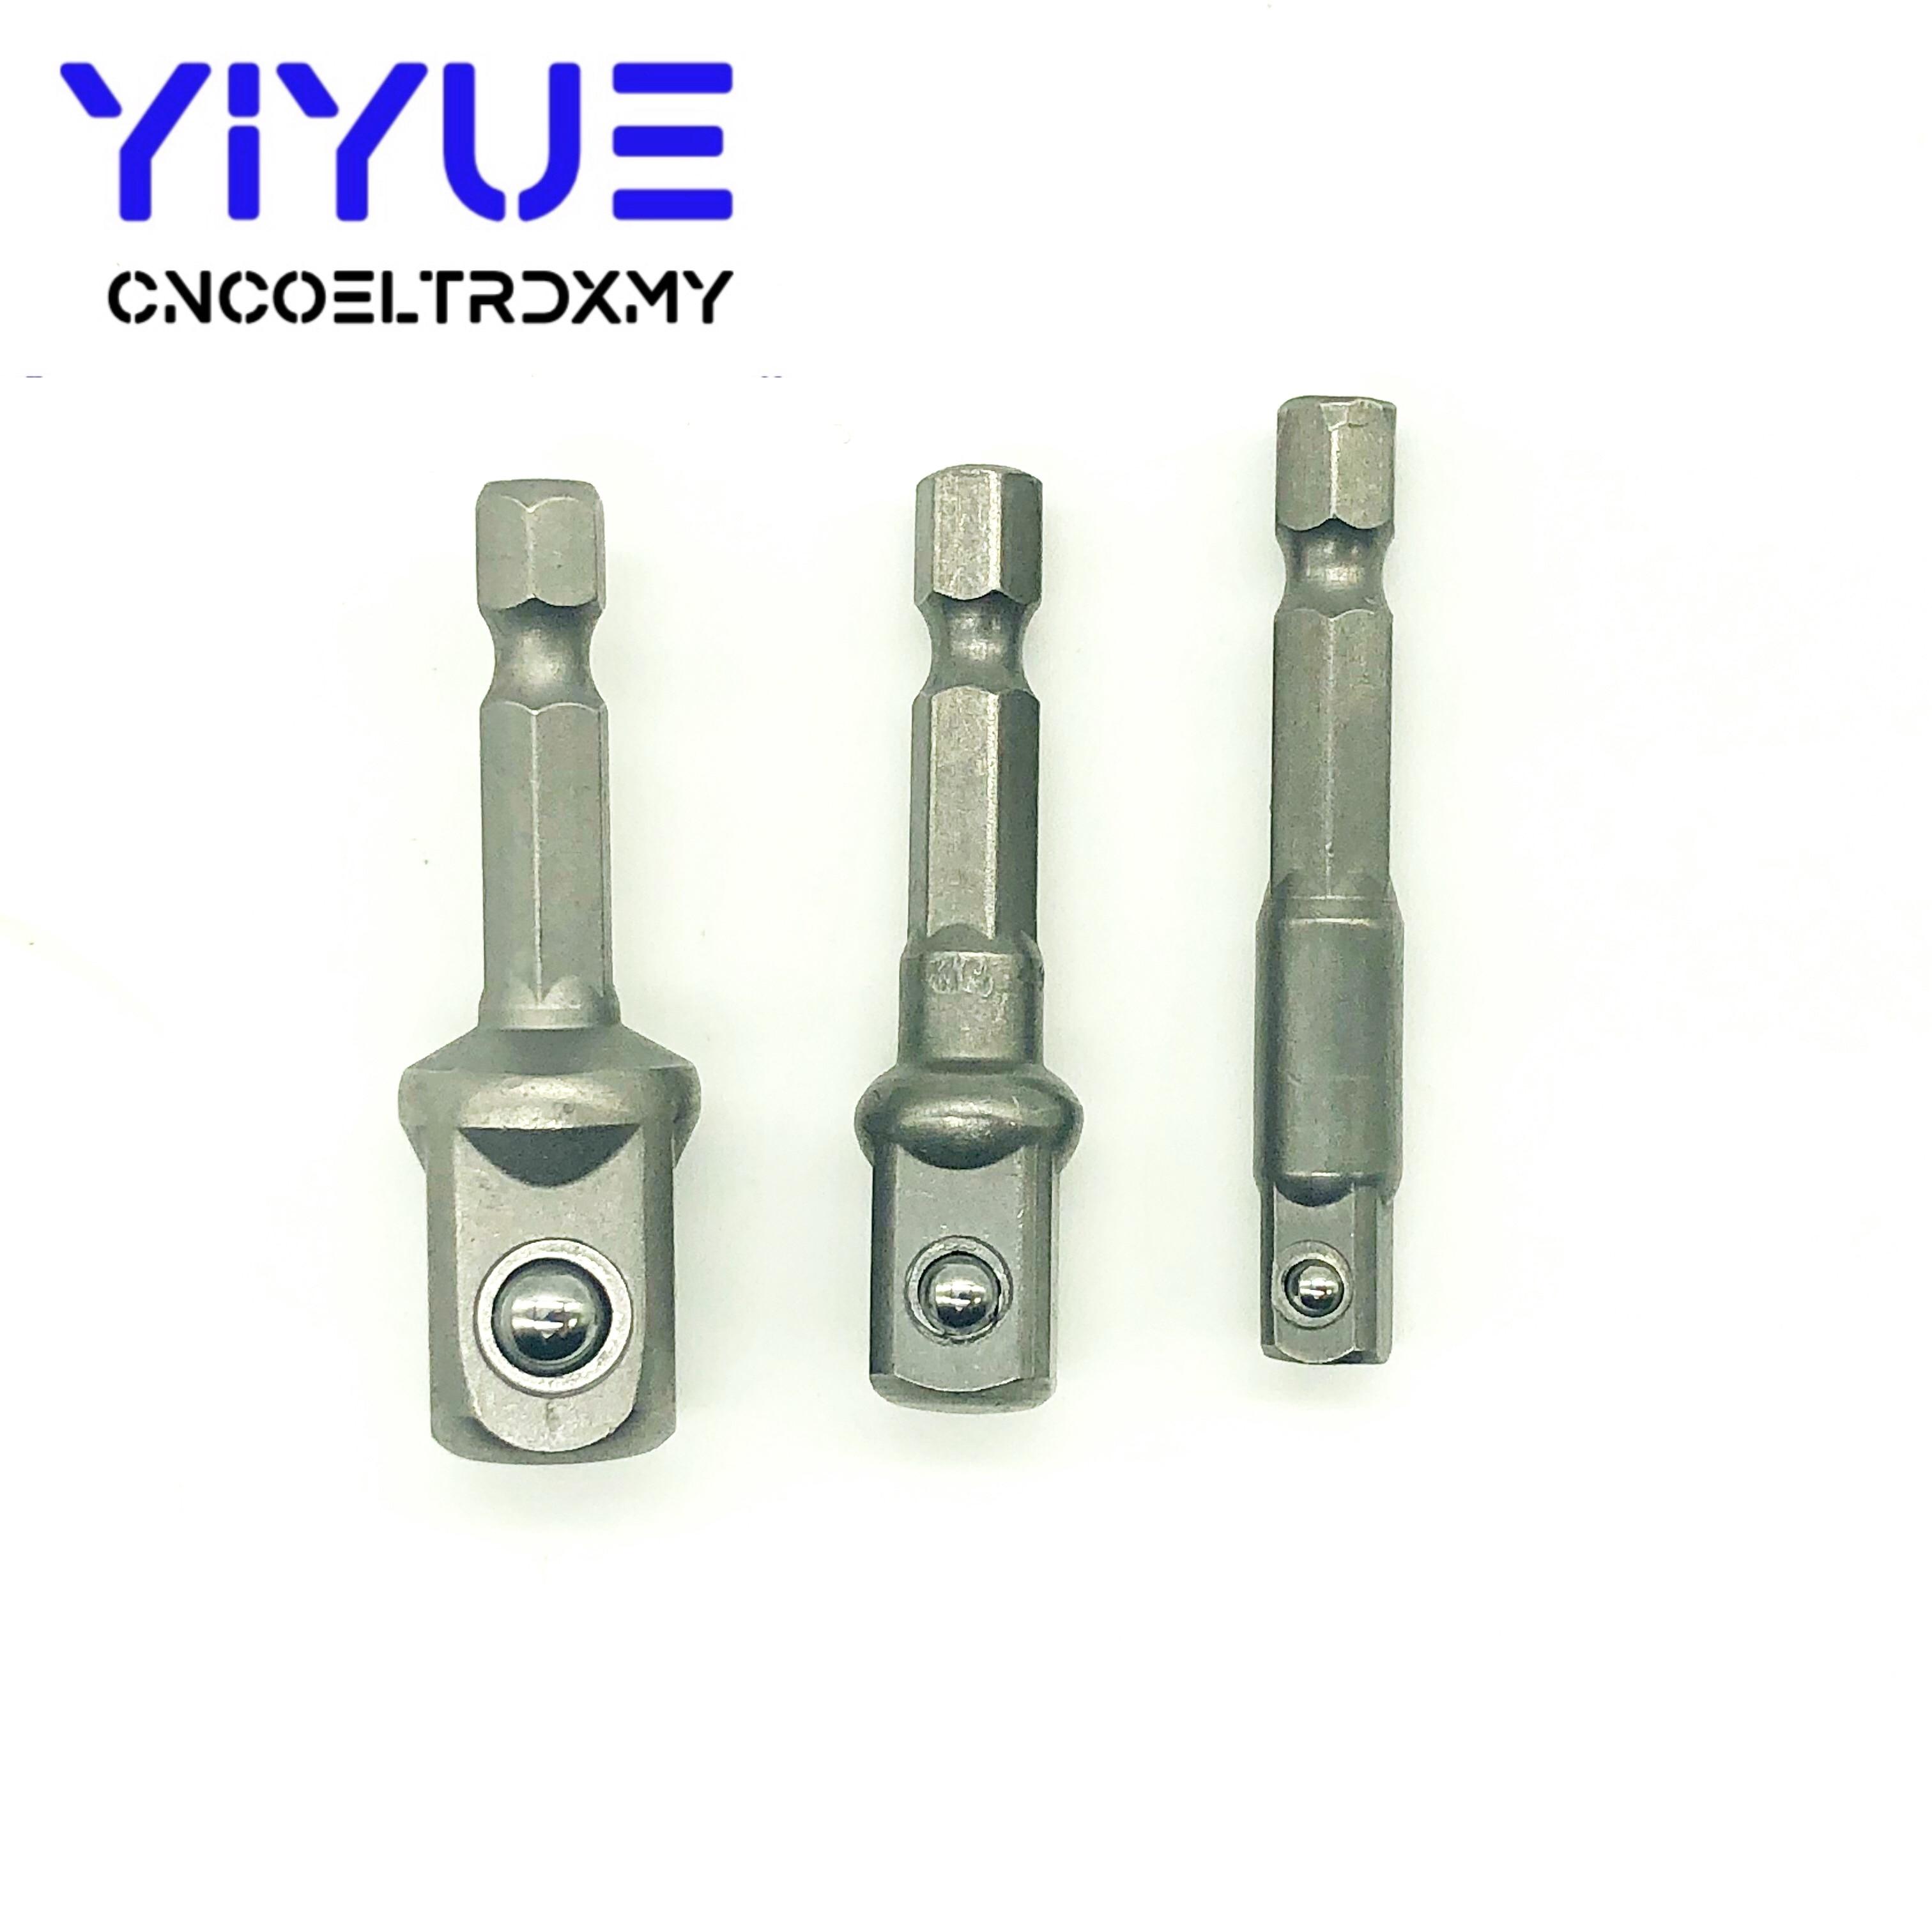 3pcs/set Chrome Vanadium Steel Socket Adapter Hex Shank To Square Extension Drill Bits Bar Hex Bit Set Tools Tightly